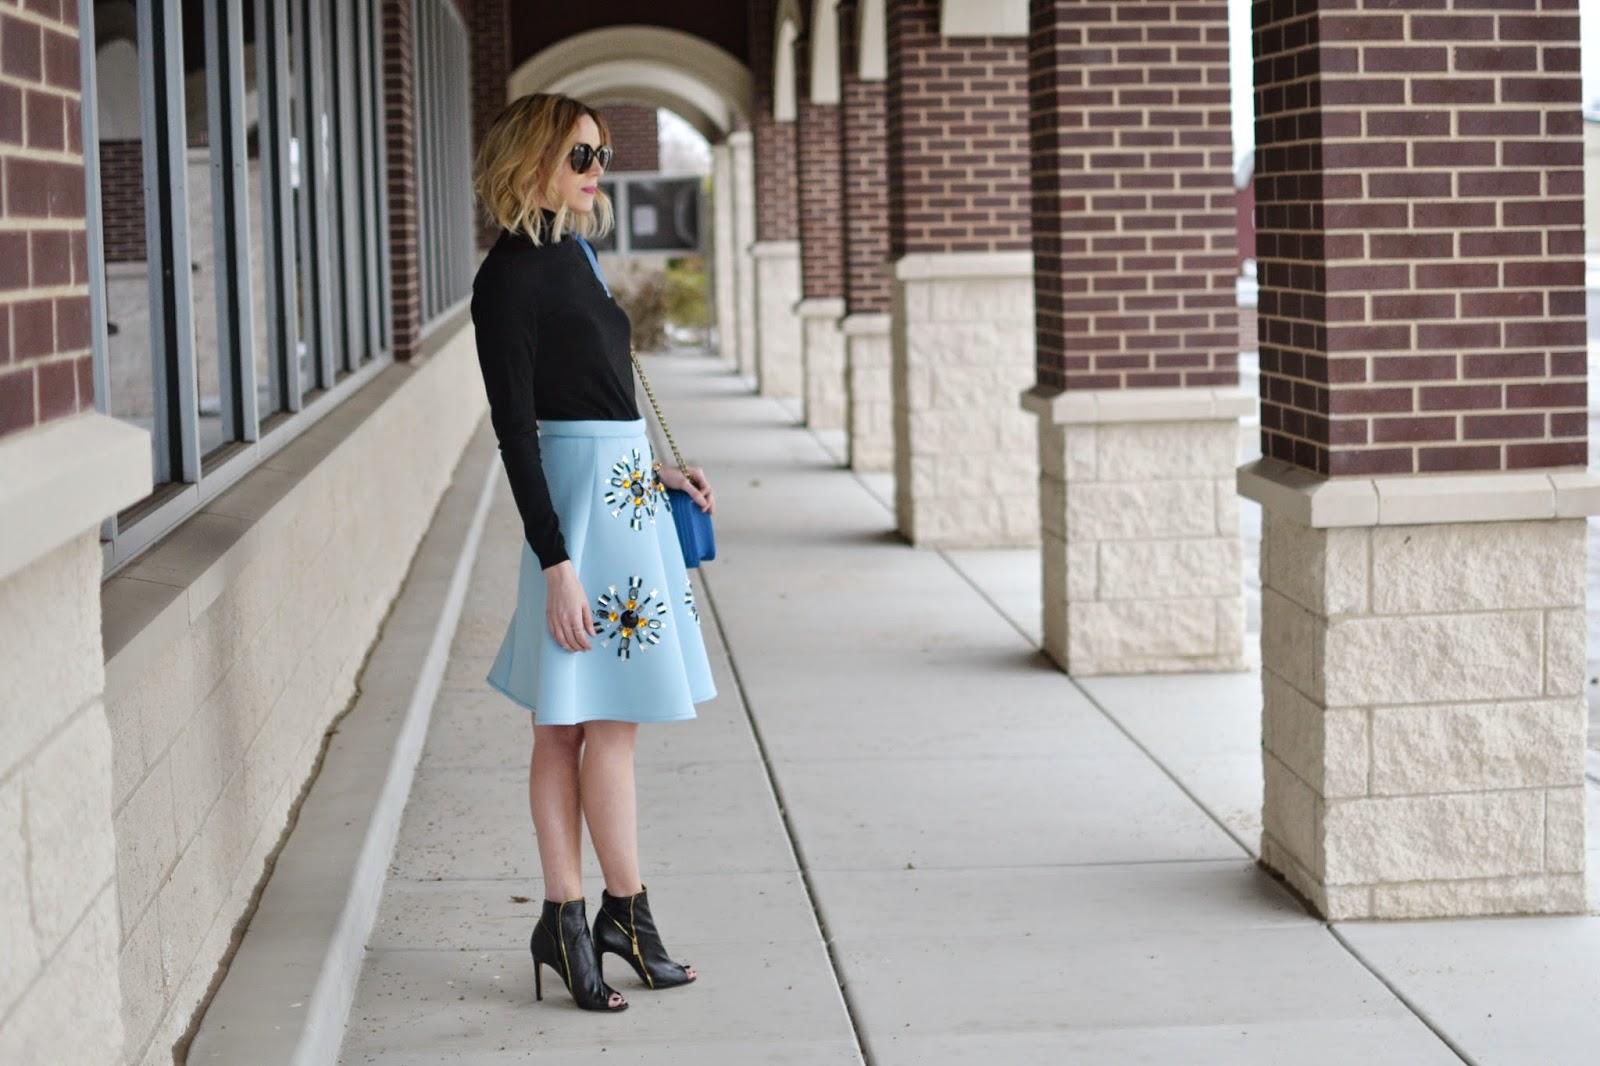 baby blue midi skirt, black turtleneck, black booties, Karen Walker Super Duper Sunglasses, blue purse, Honeybee jewelry